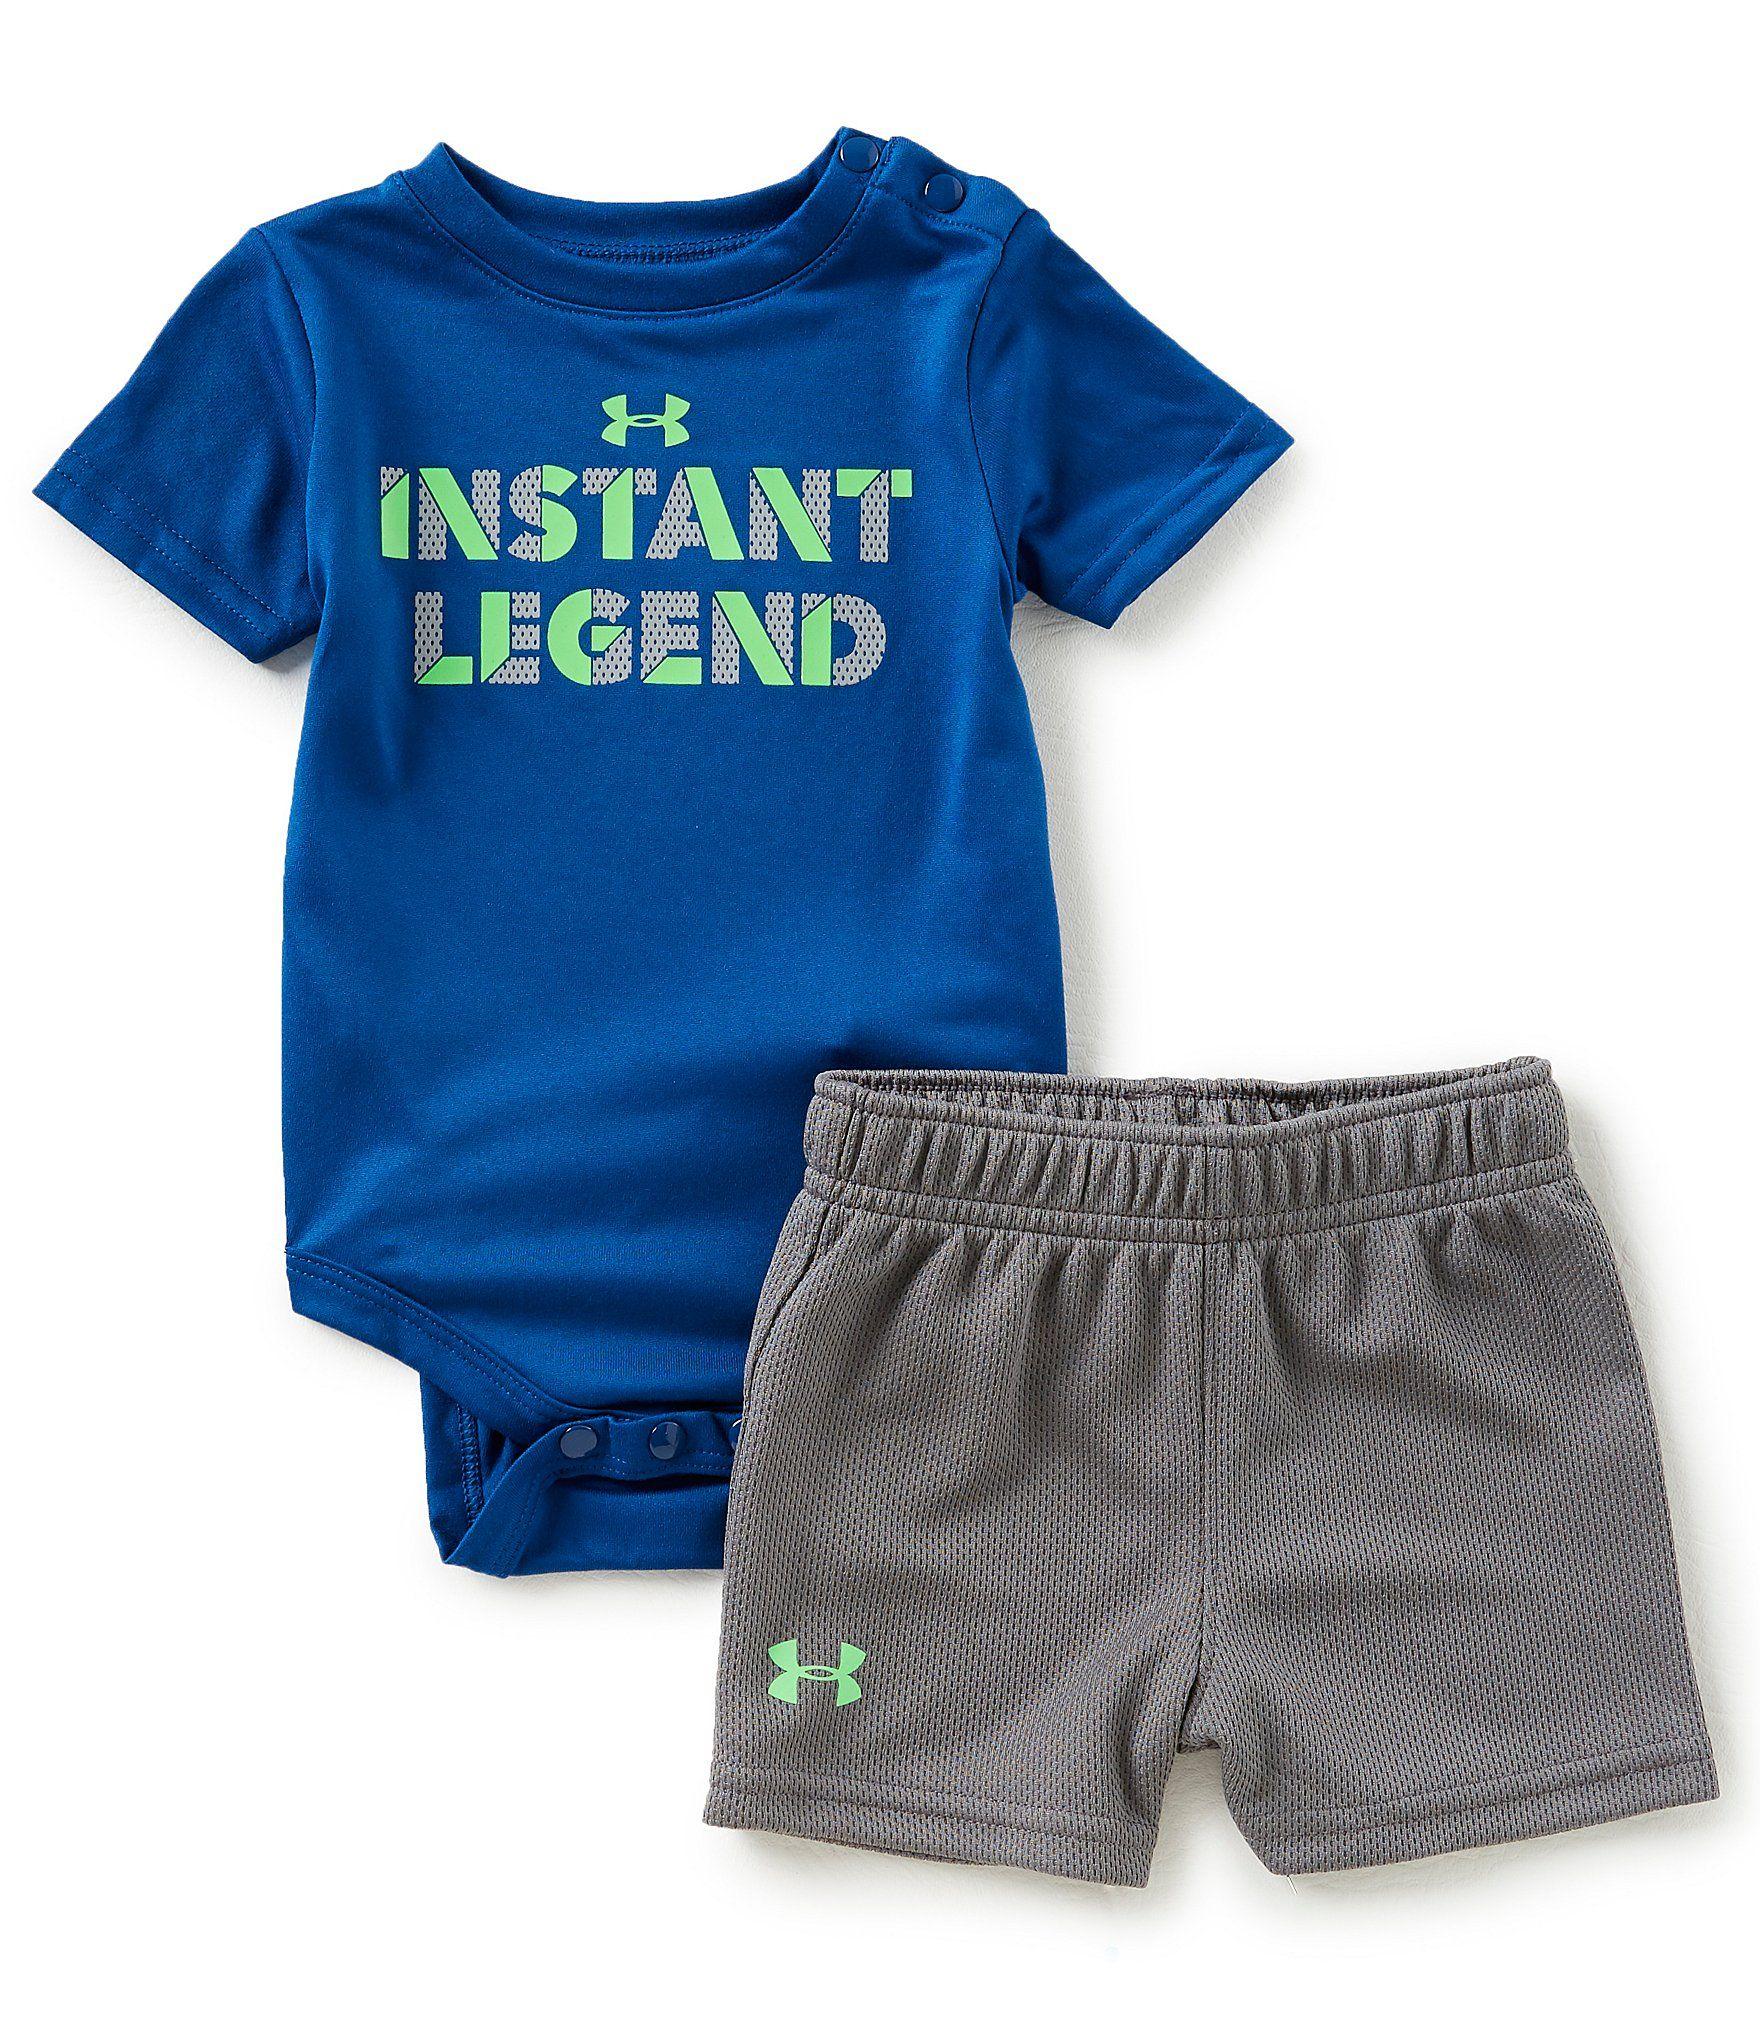 Shop For Under Armour Baby Boys Newborn 12 Months Short